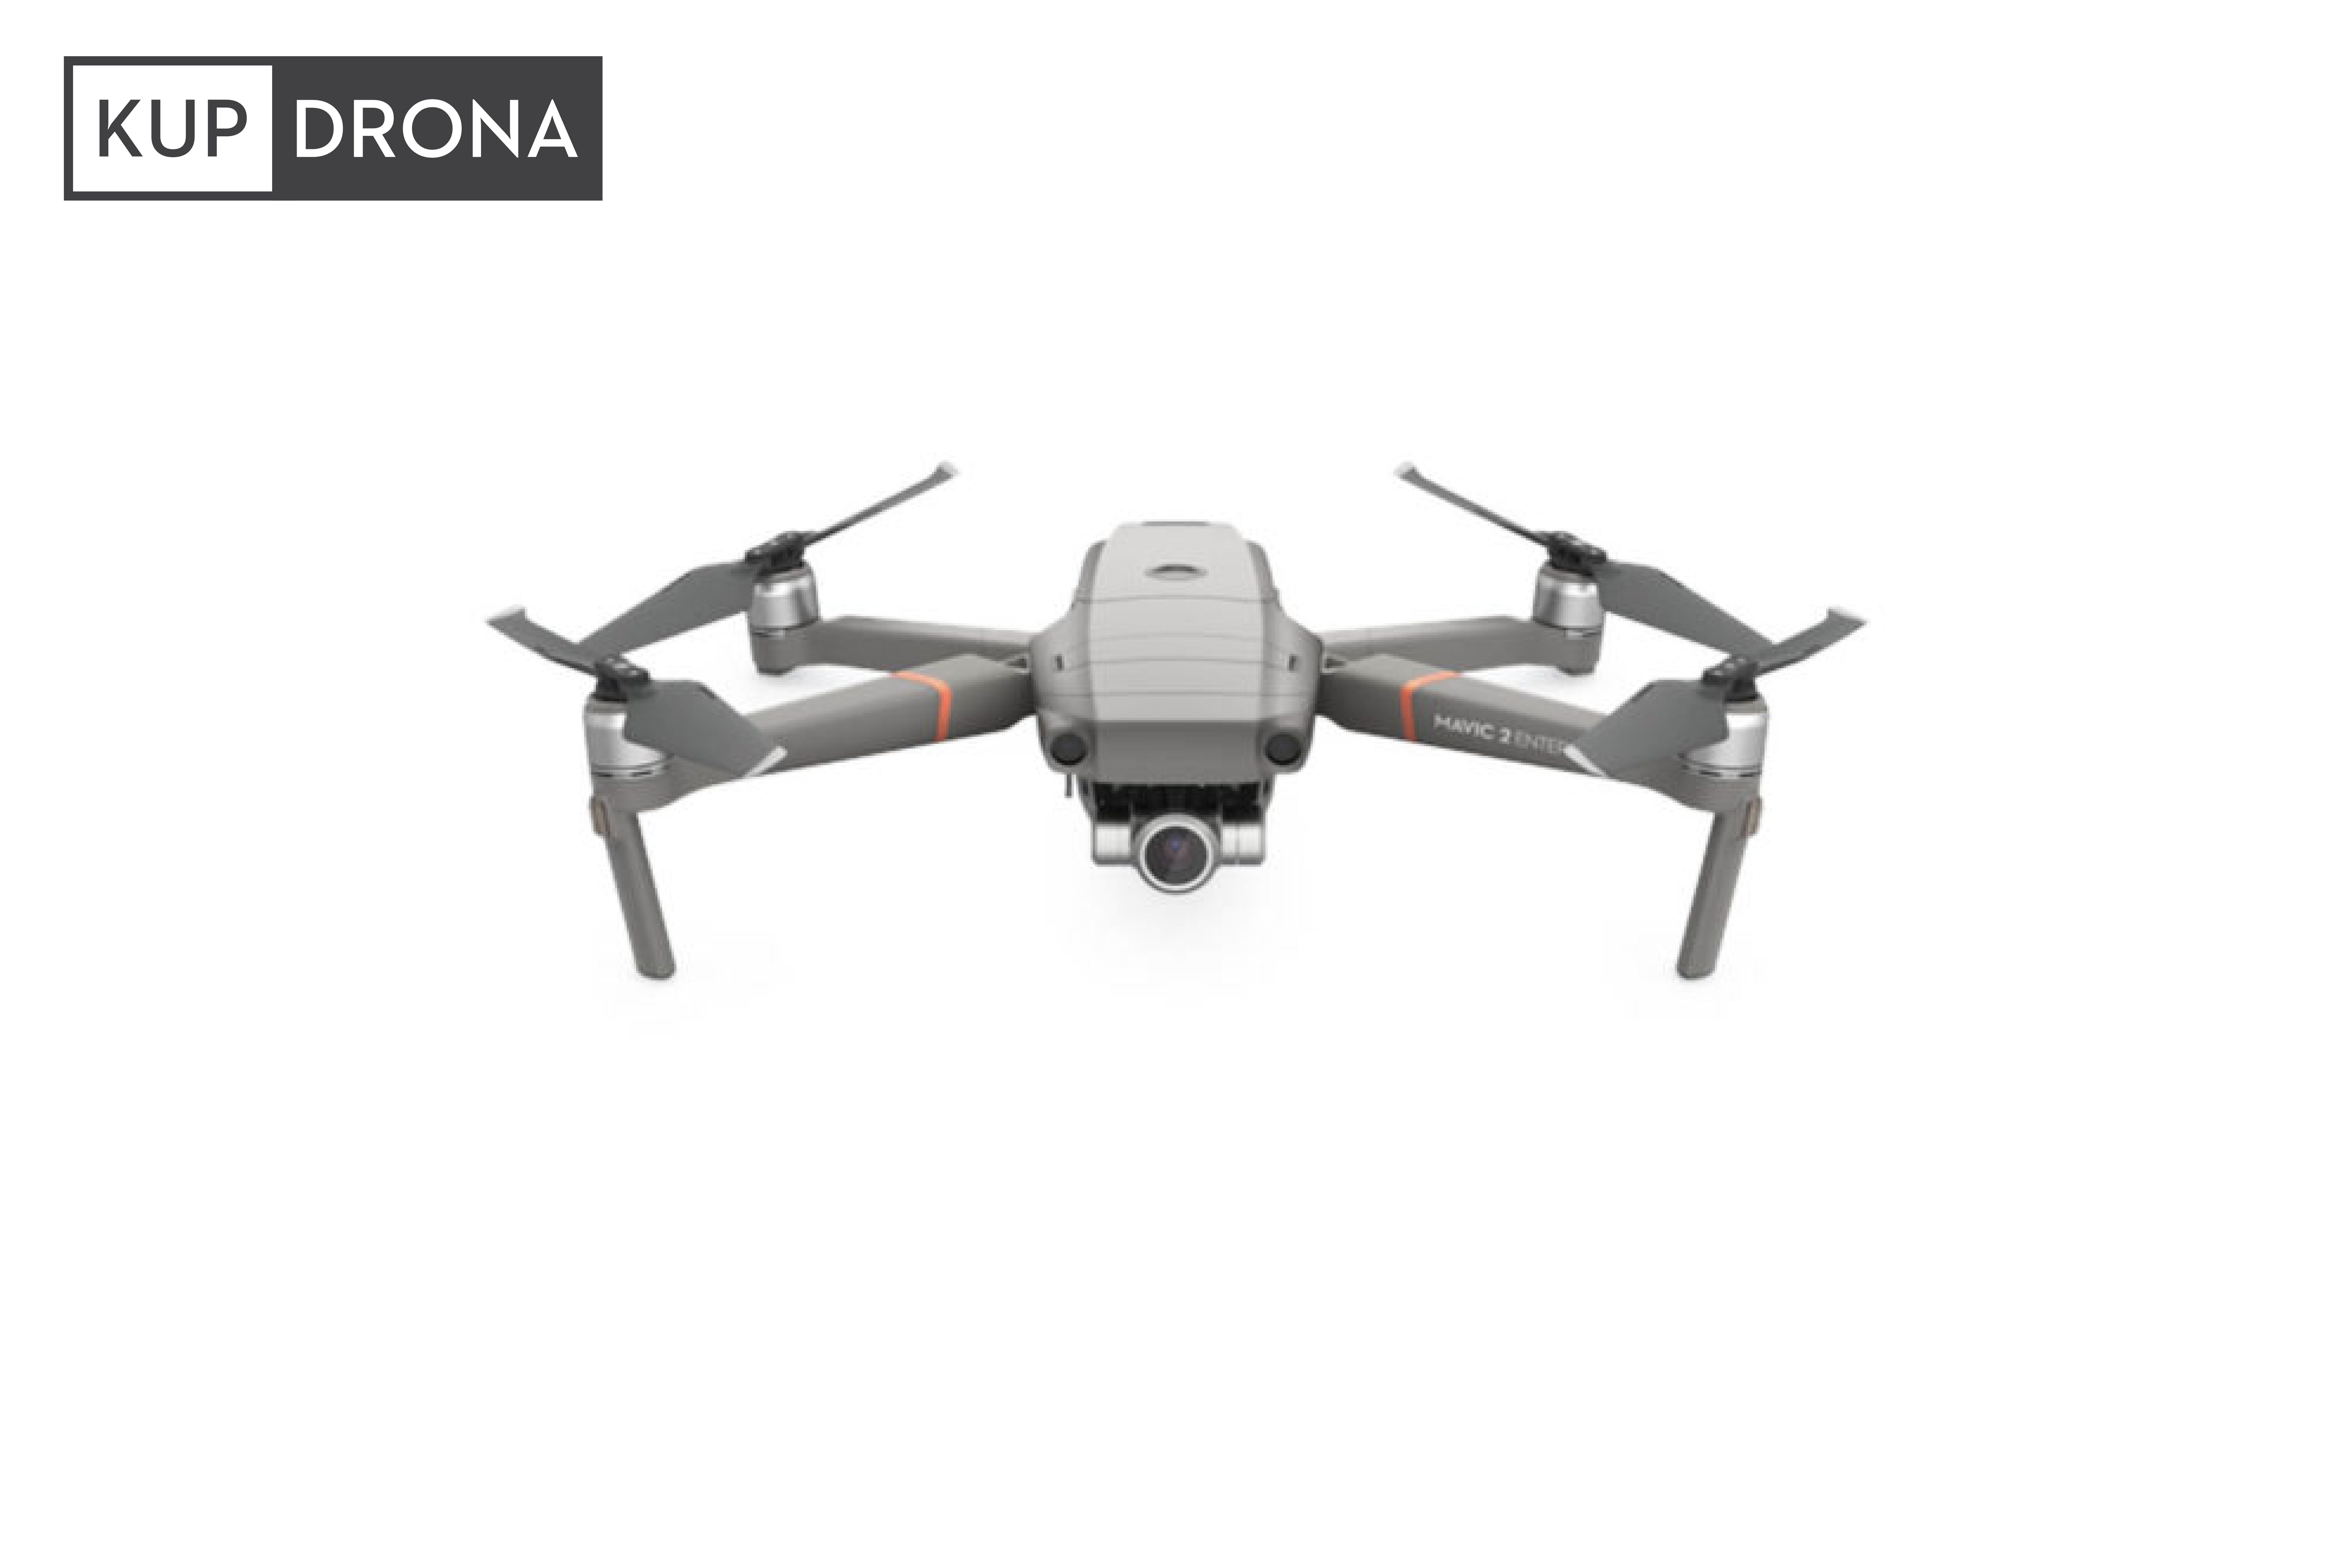 Gps Drone Jxd 518 Rc Quadrocopter Carry 2mp Wifi Camera 2 4g 4ch